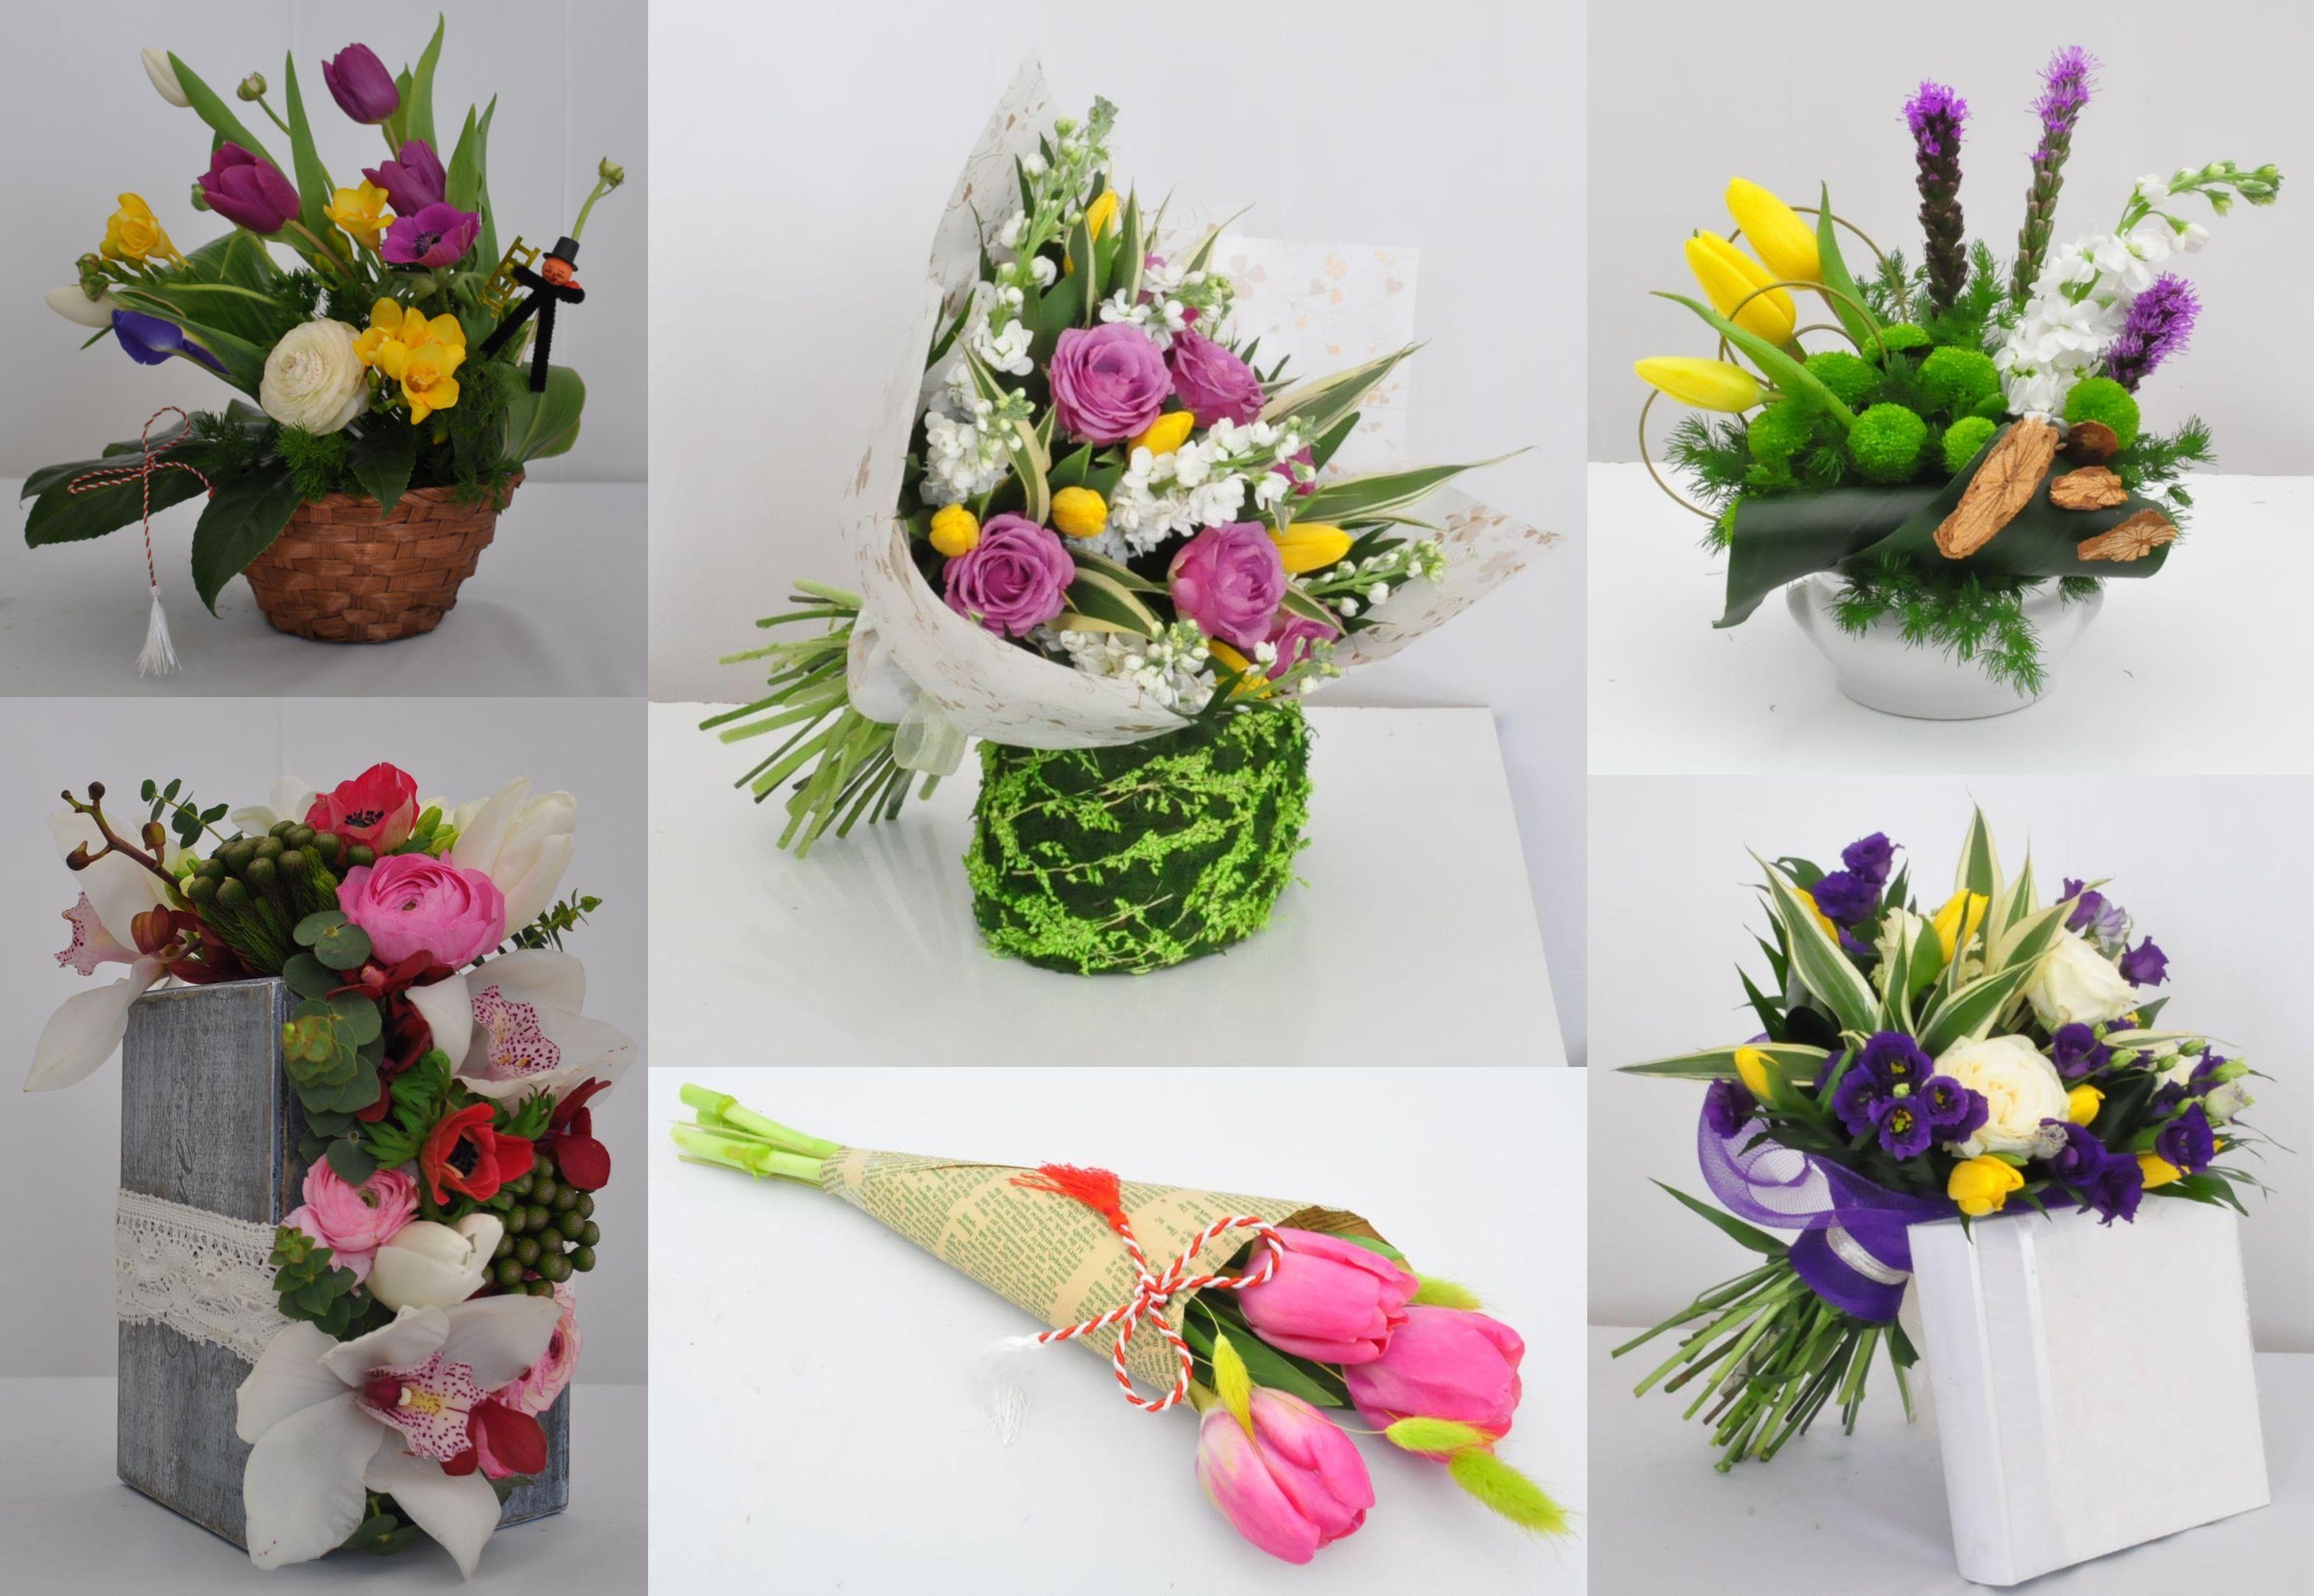 Buchete si aranjamente florale propuse de Fleur blanche